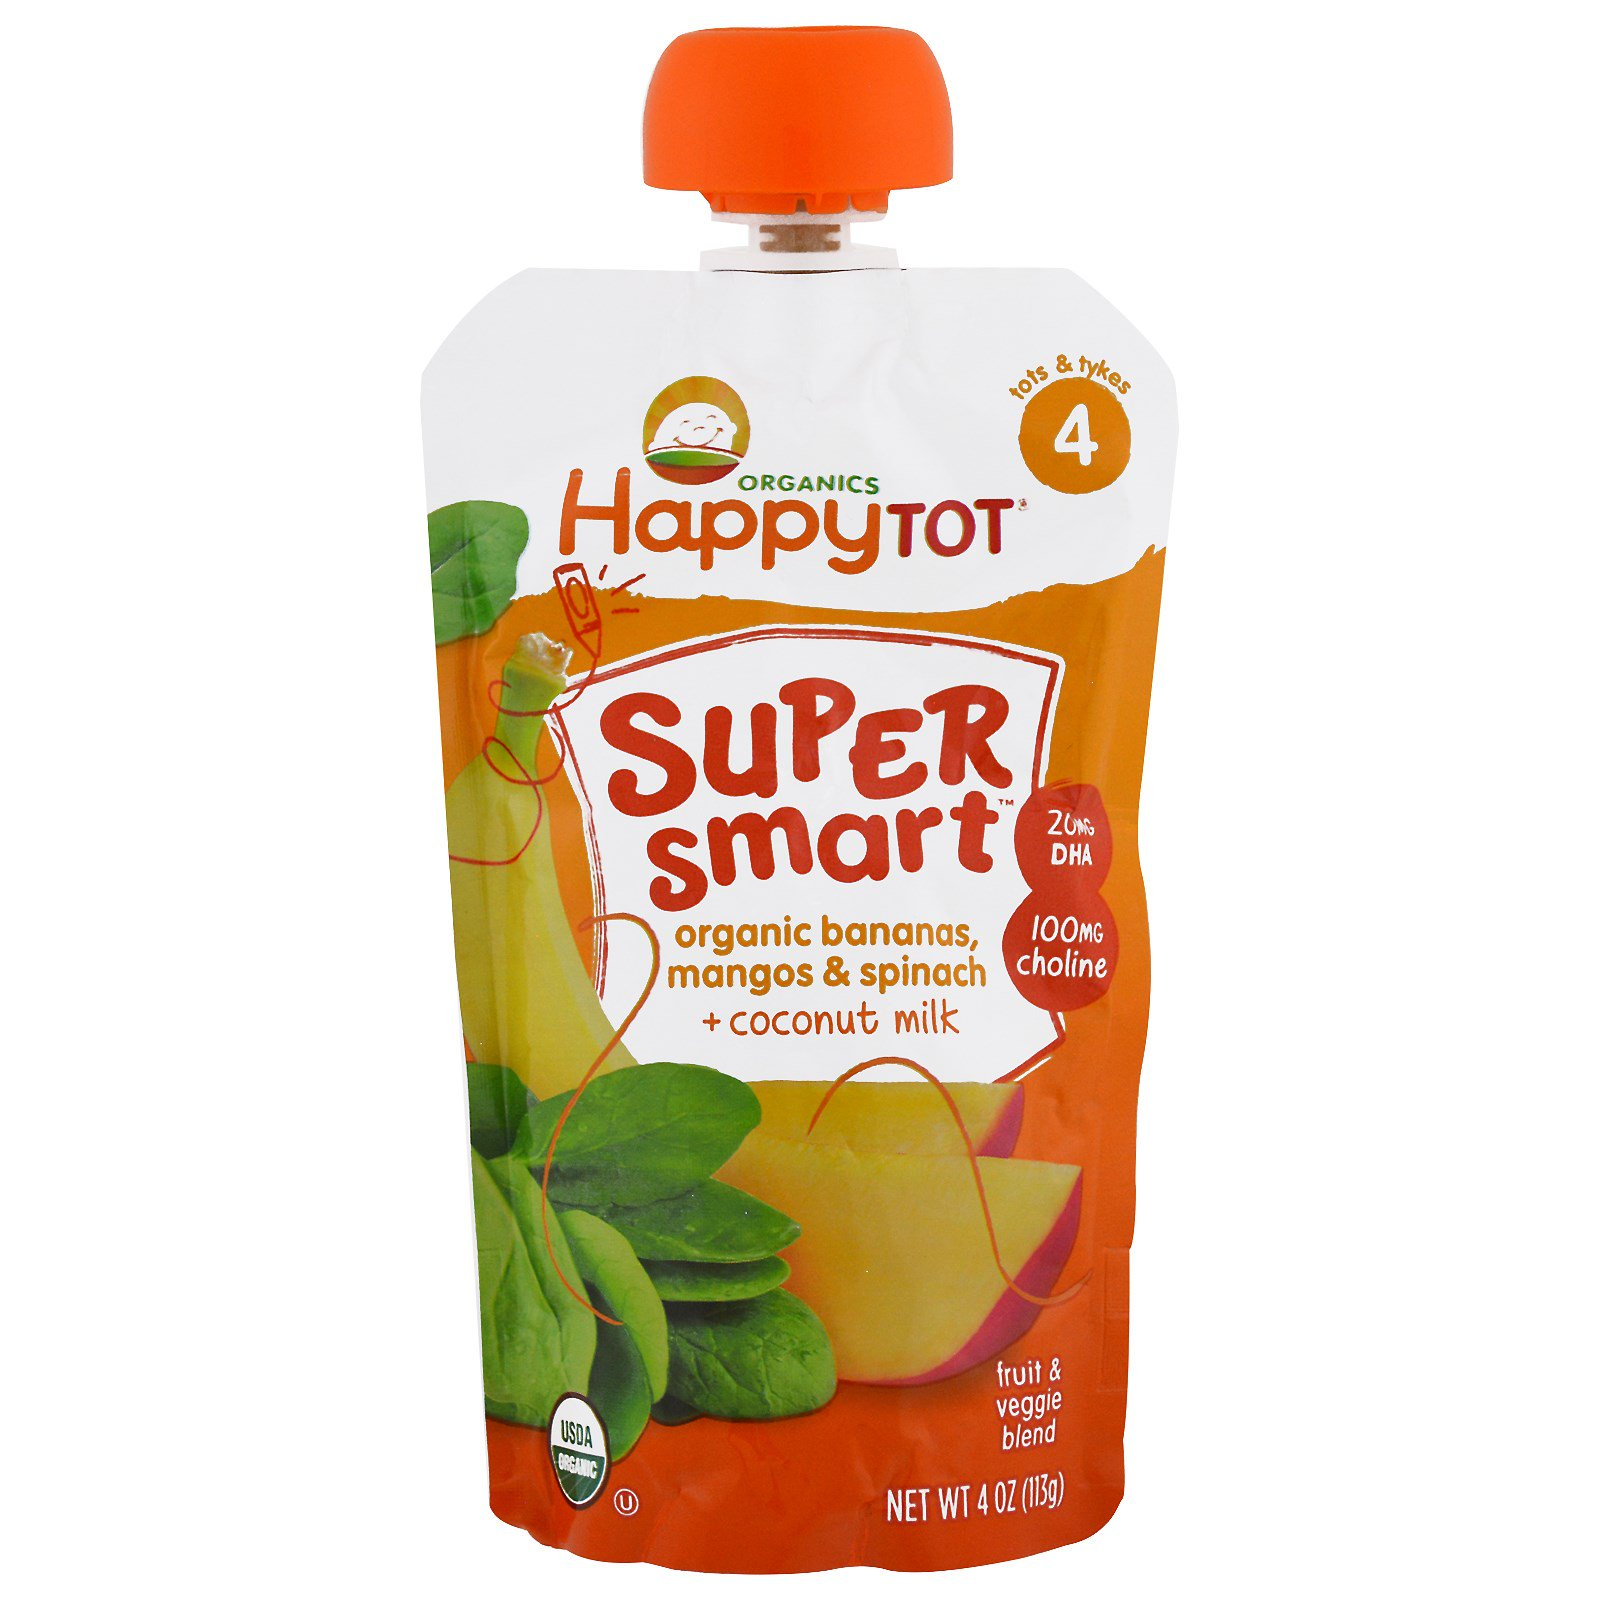 Nurture Inc. (Happy Baby), Happy Tot, Stage 4, Super Smart, Fruit and Veggie Blend, Organic Bananas, Mangos & Spinach, Coconut Milk, 4 oz (pack of 1)